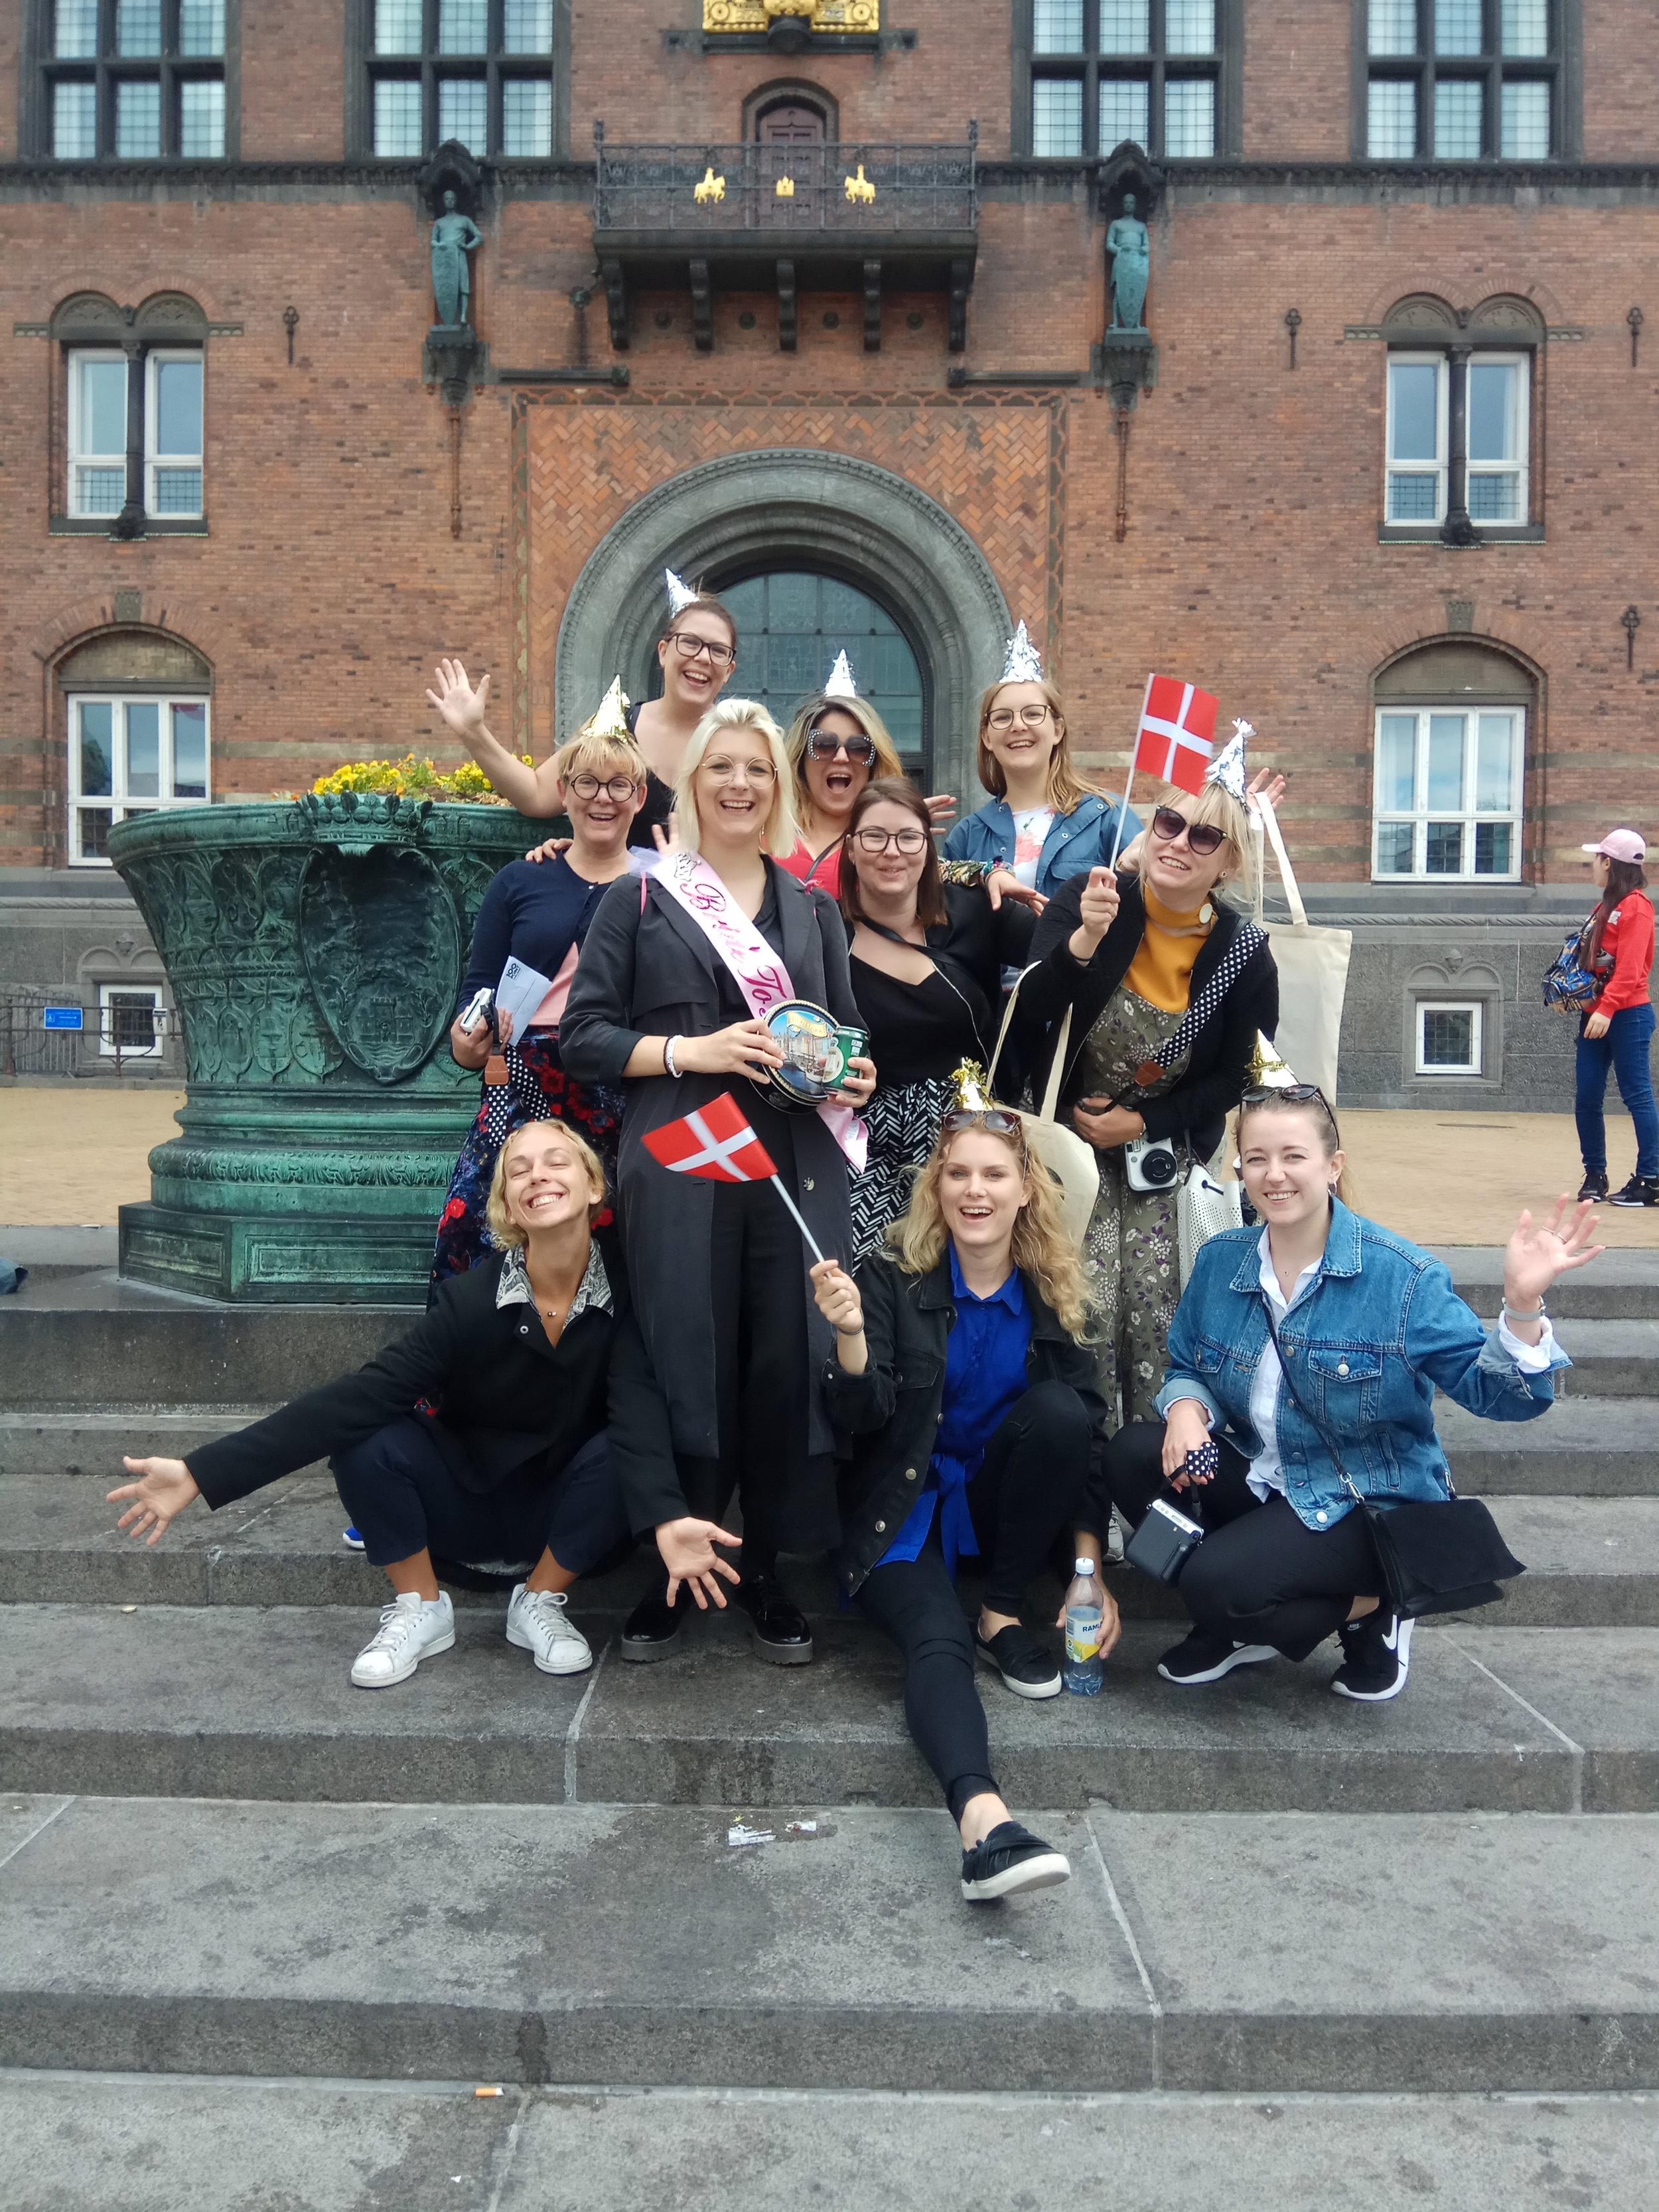 IMG_20190609_142323 - 100 Point Challenge Copenhagen.jpg